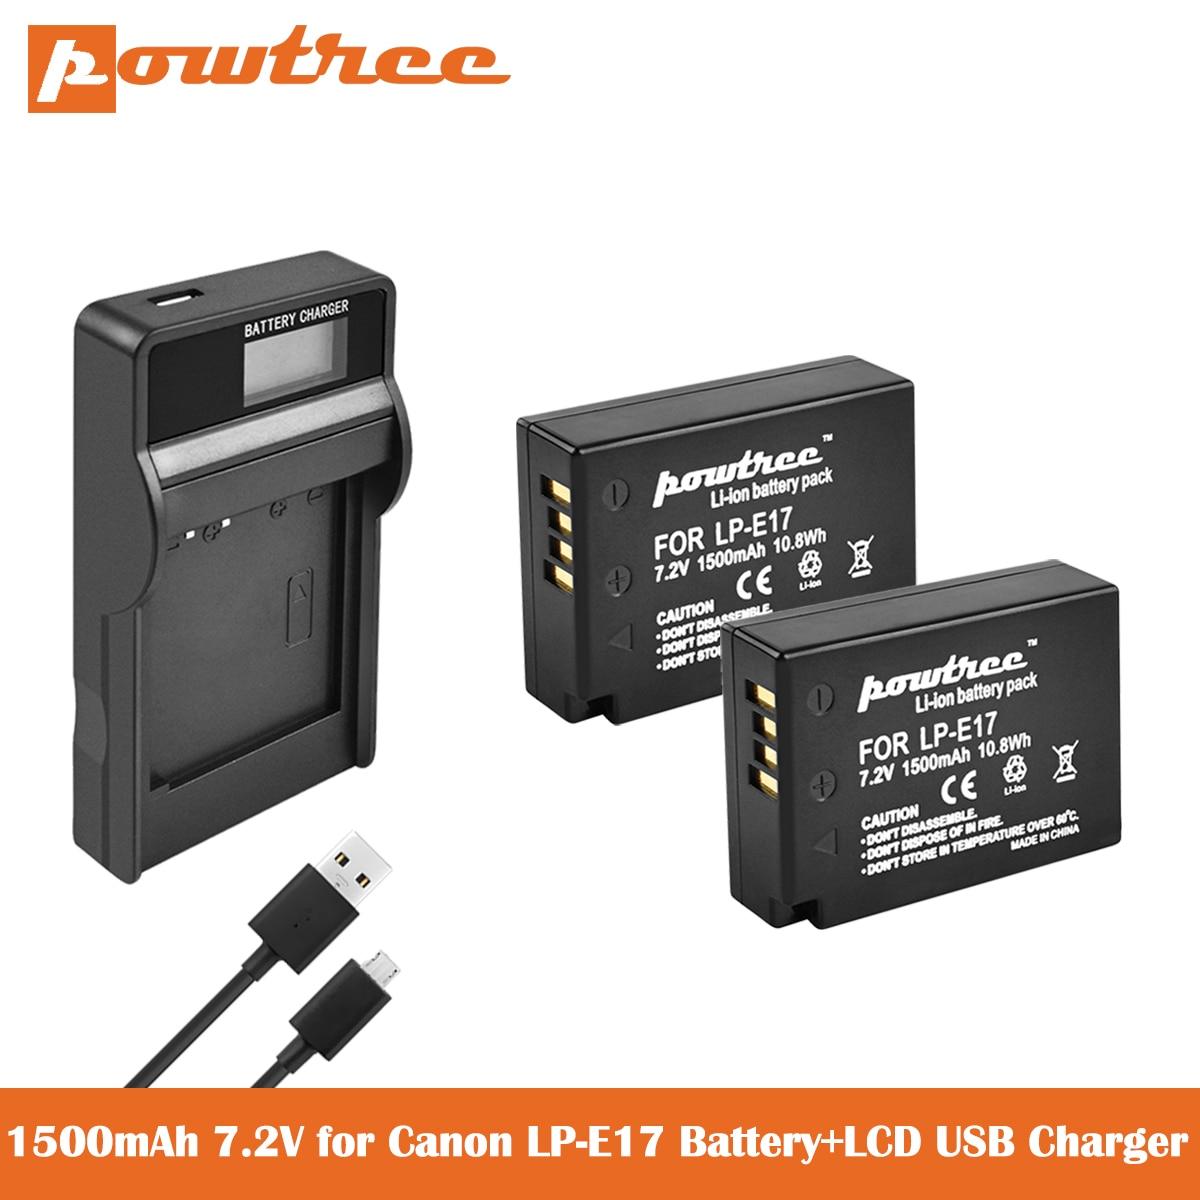 LCD Charger for Canon EOS M3 M5 M6 77D 750D 760D 800D Cameras LP-E17 Battery